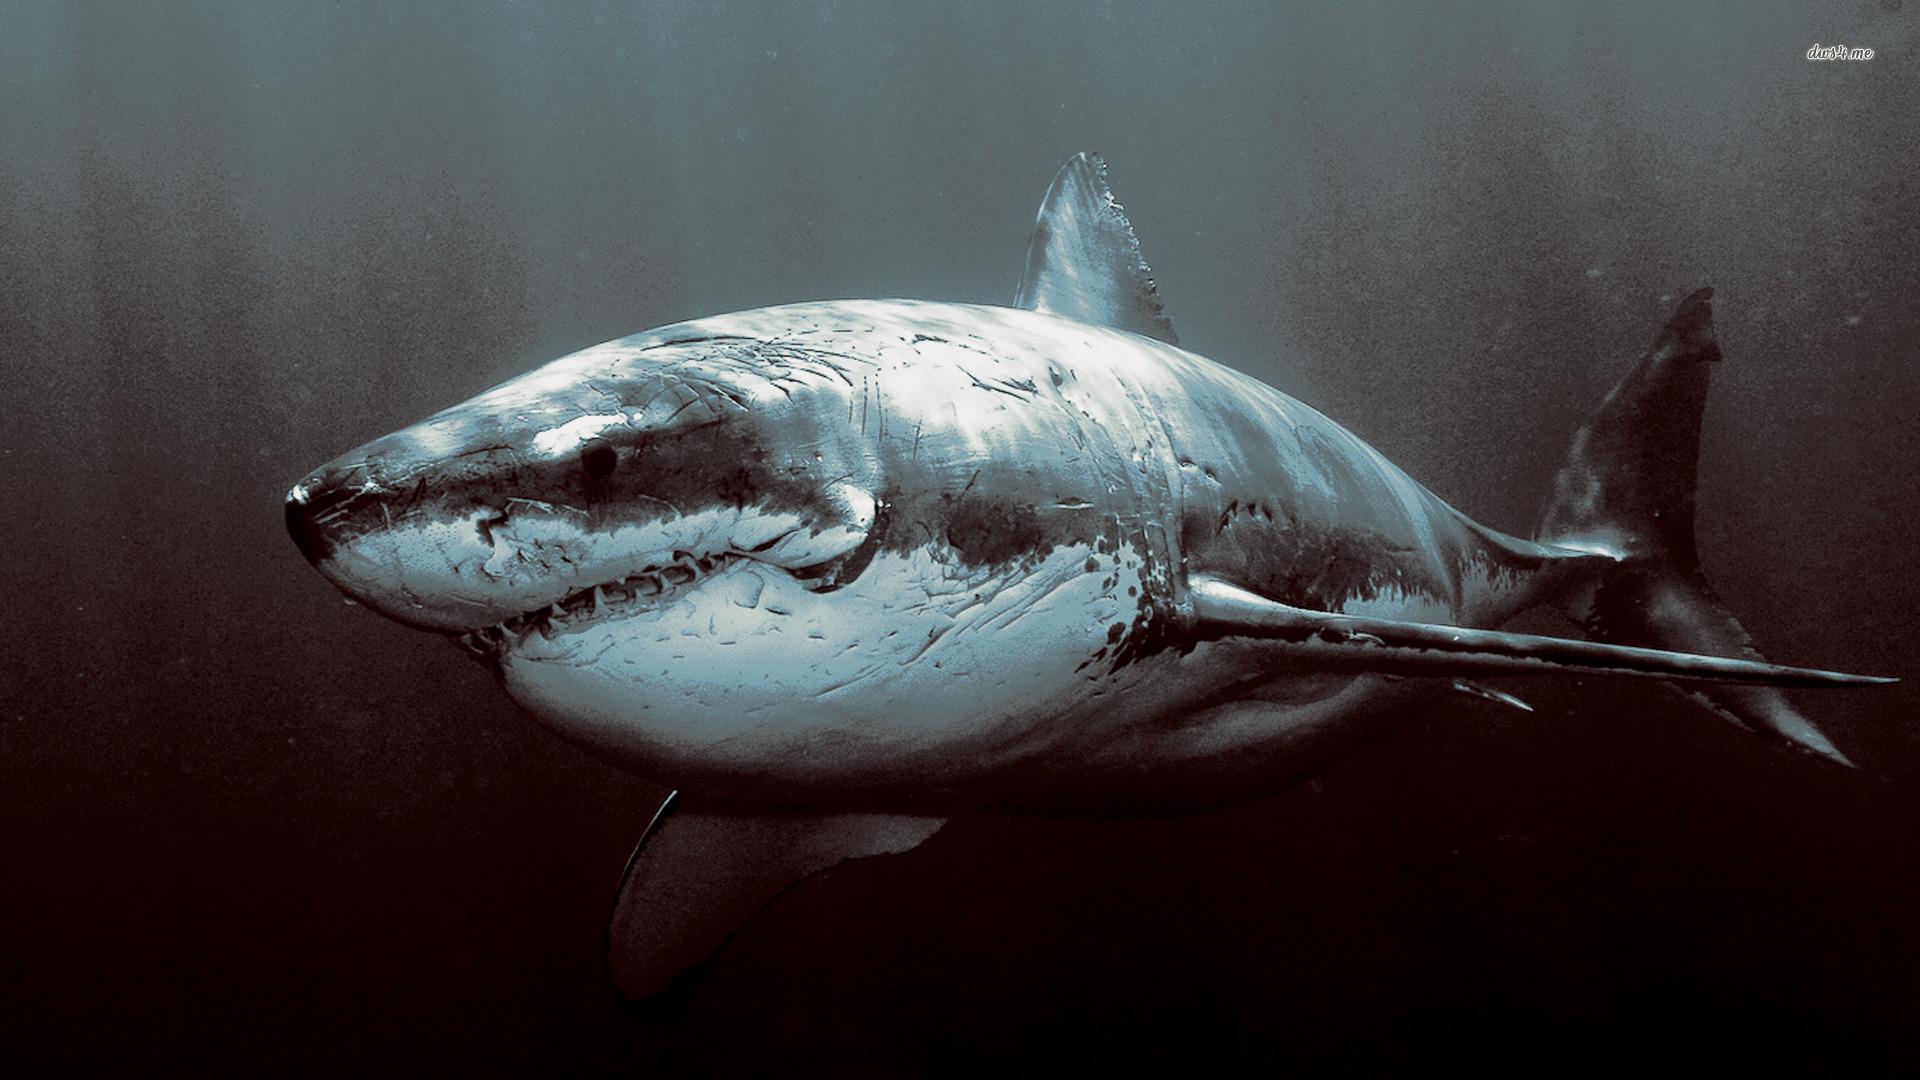 Shark download free wallpapers